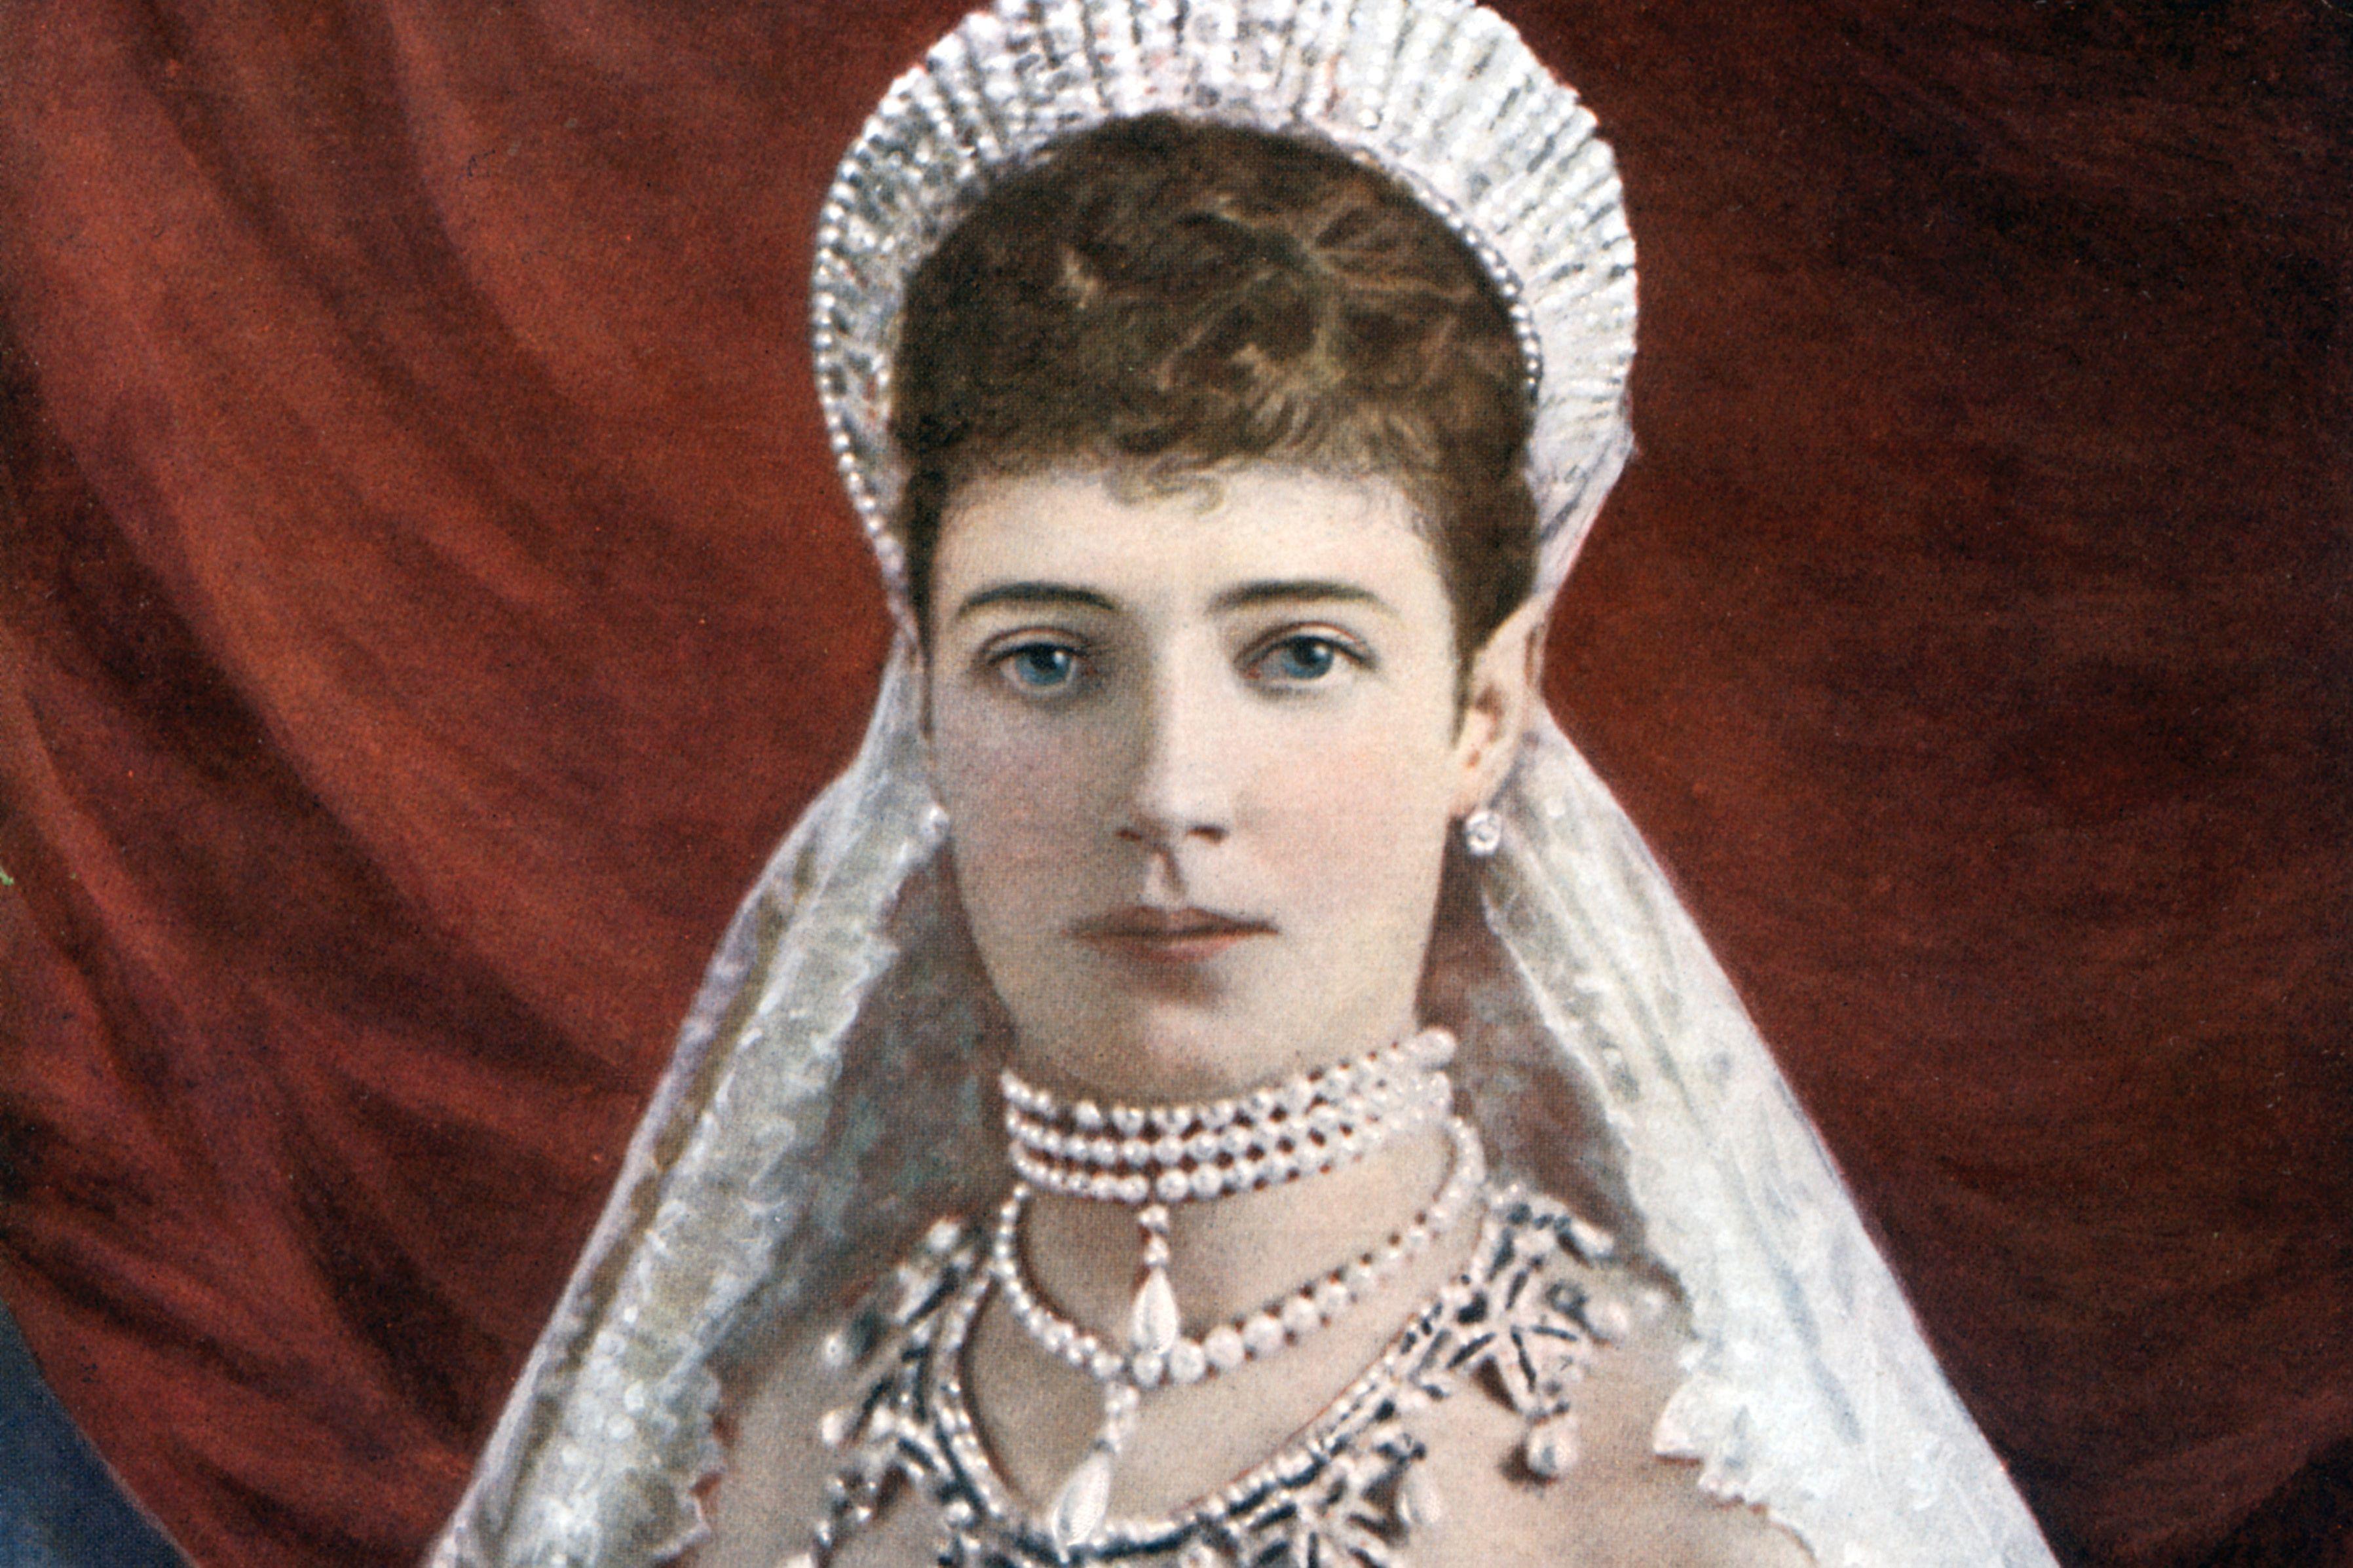 Princess Marie Sophie Frederikke Dagmar, Dowager Empress of Russia